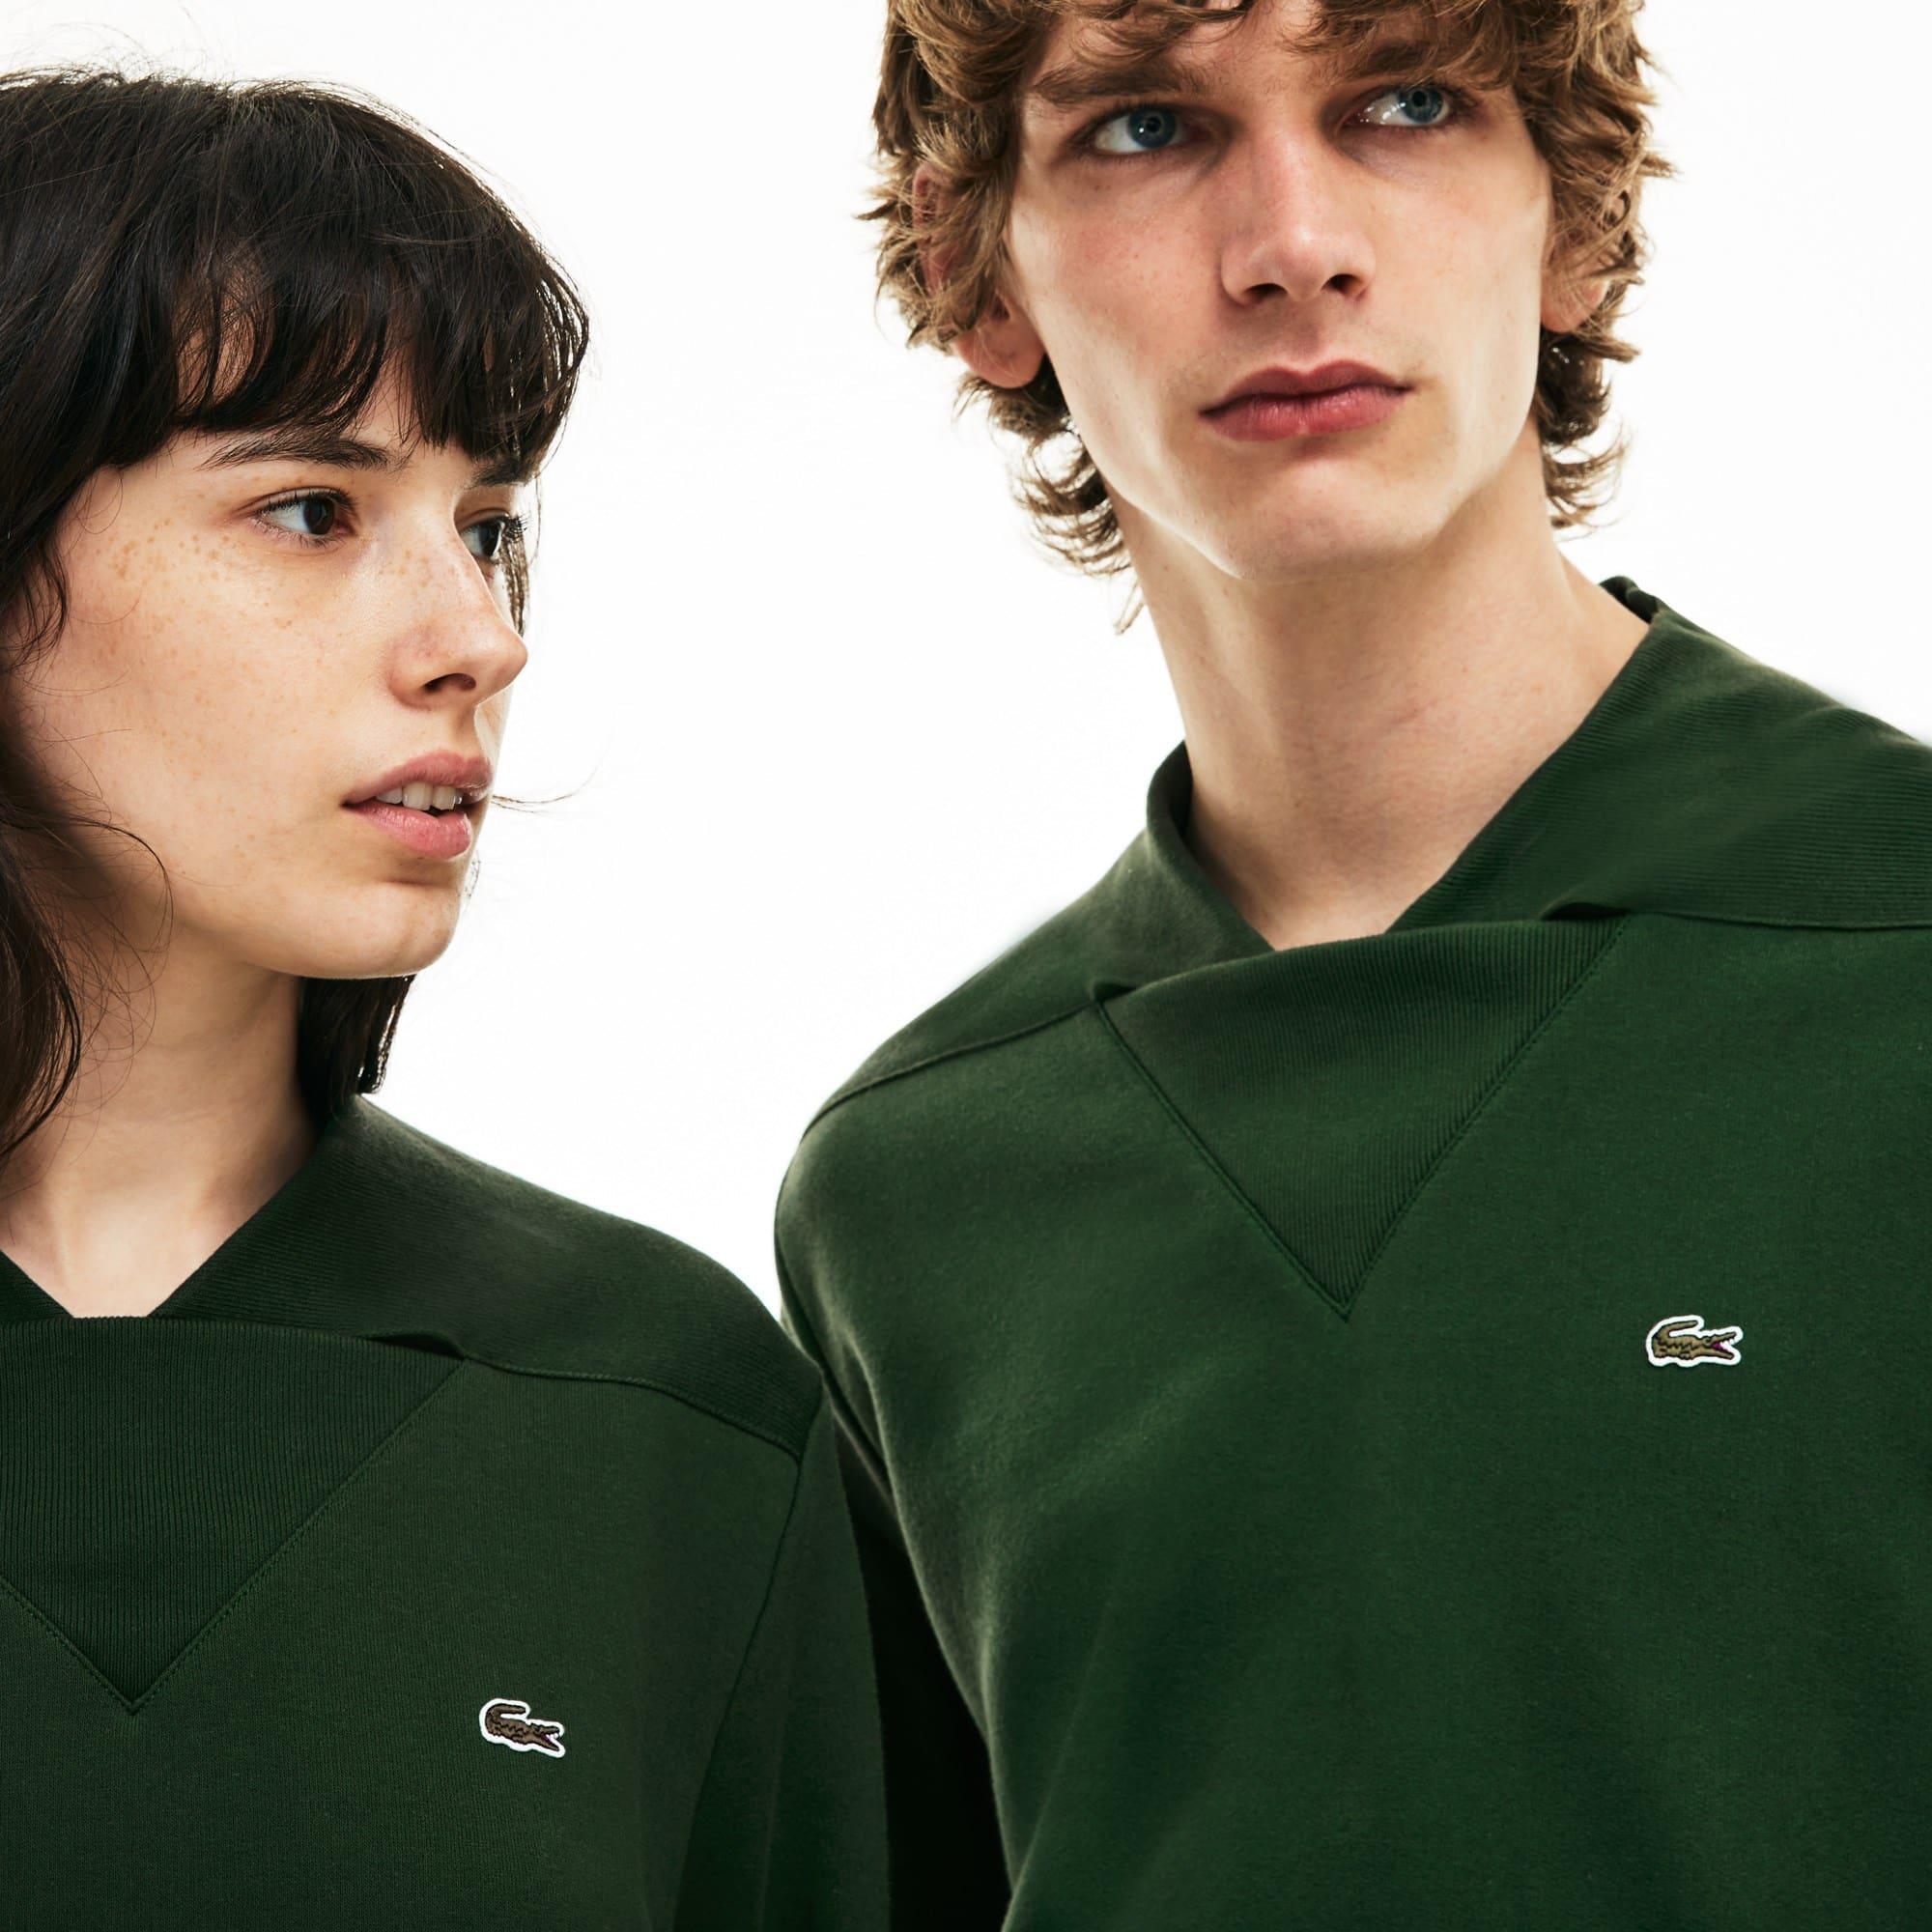 Unisex 1950s Revival 85th Anniversary Limited Edition V-neck Fleece Sweatshirt